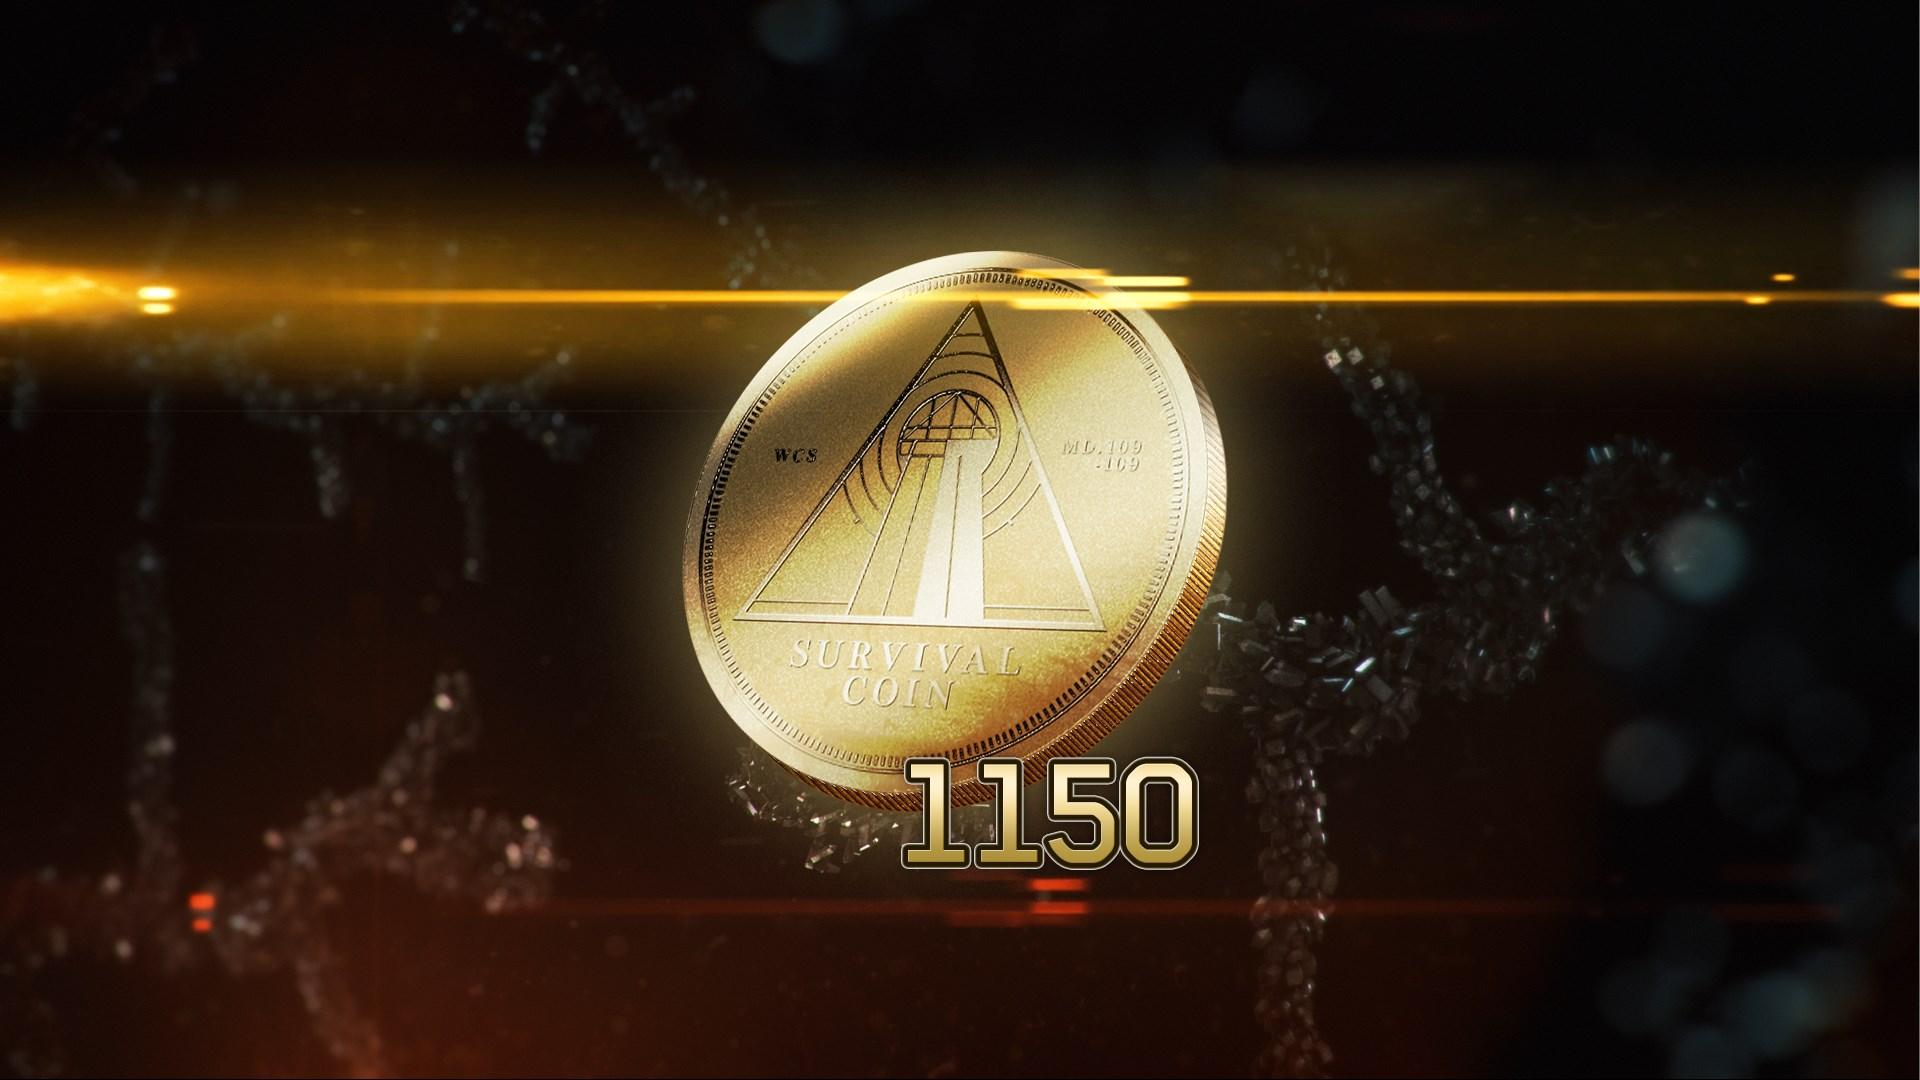 1150 SV COINS